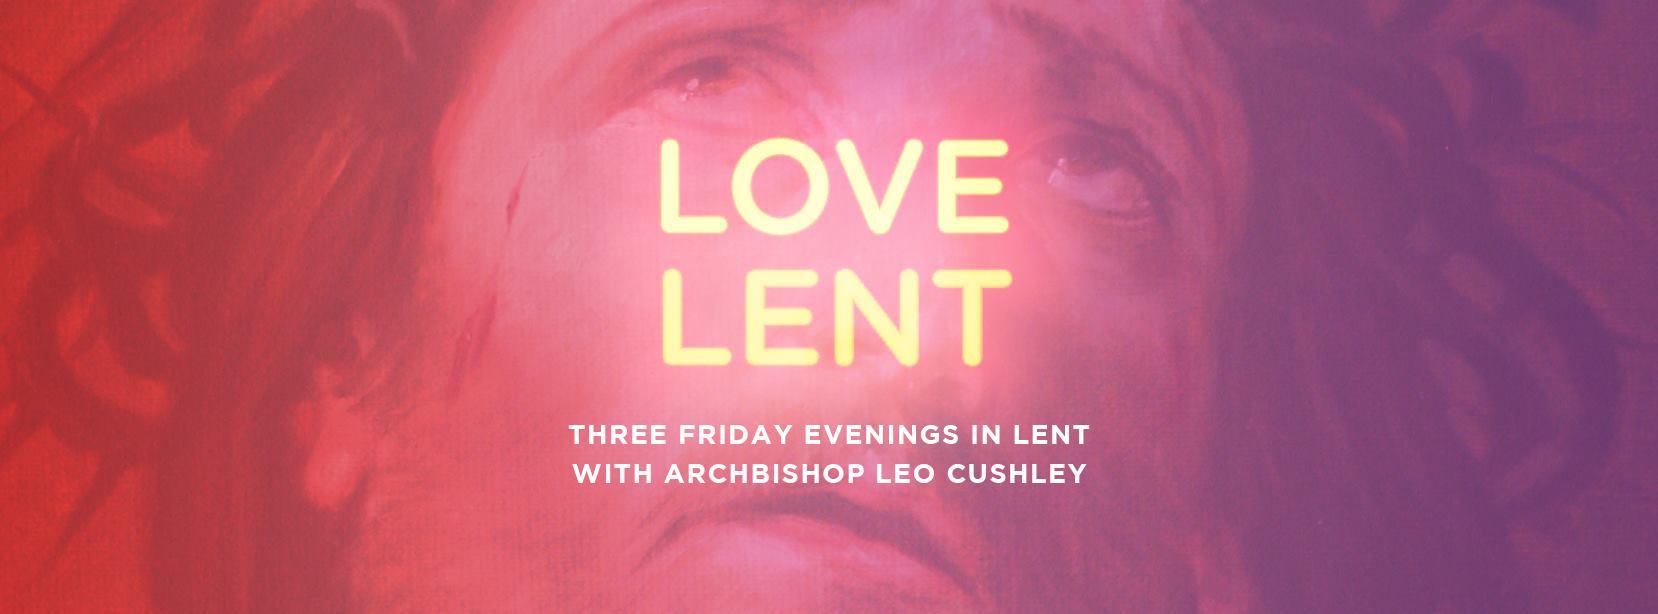 Love Lent graphic